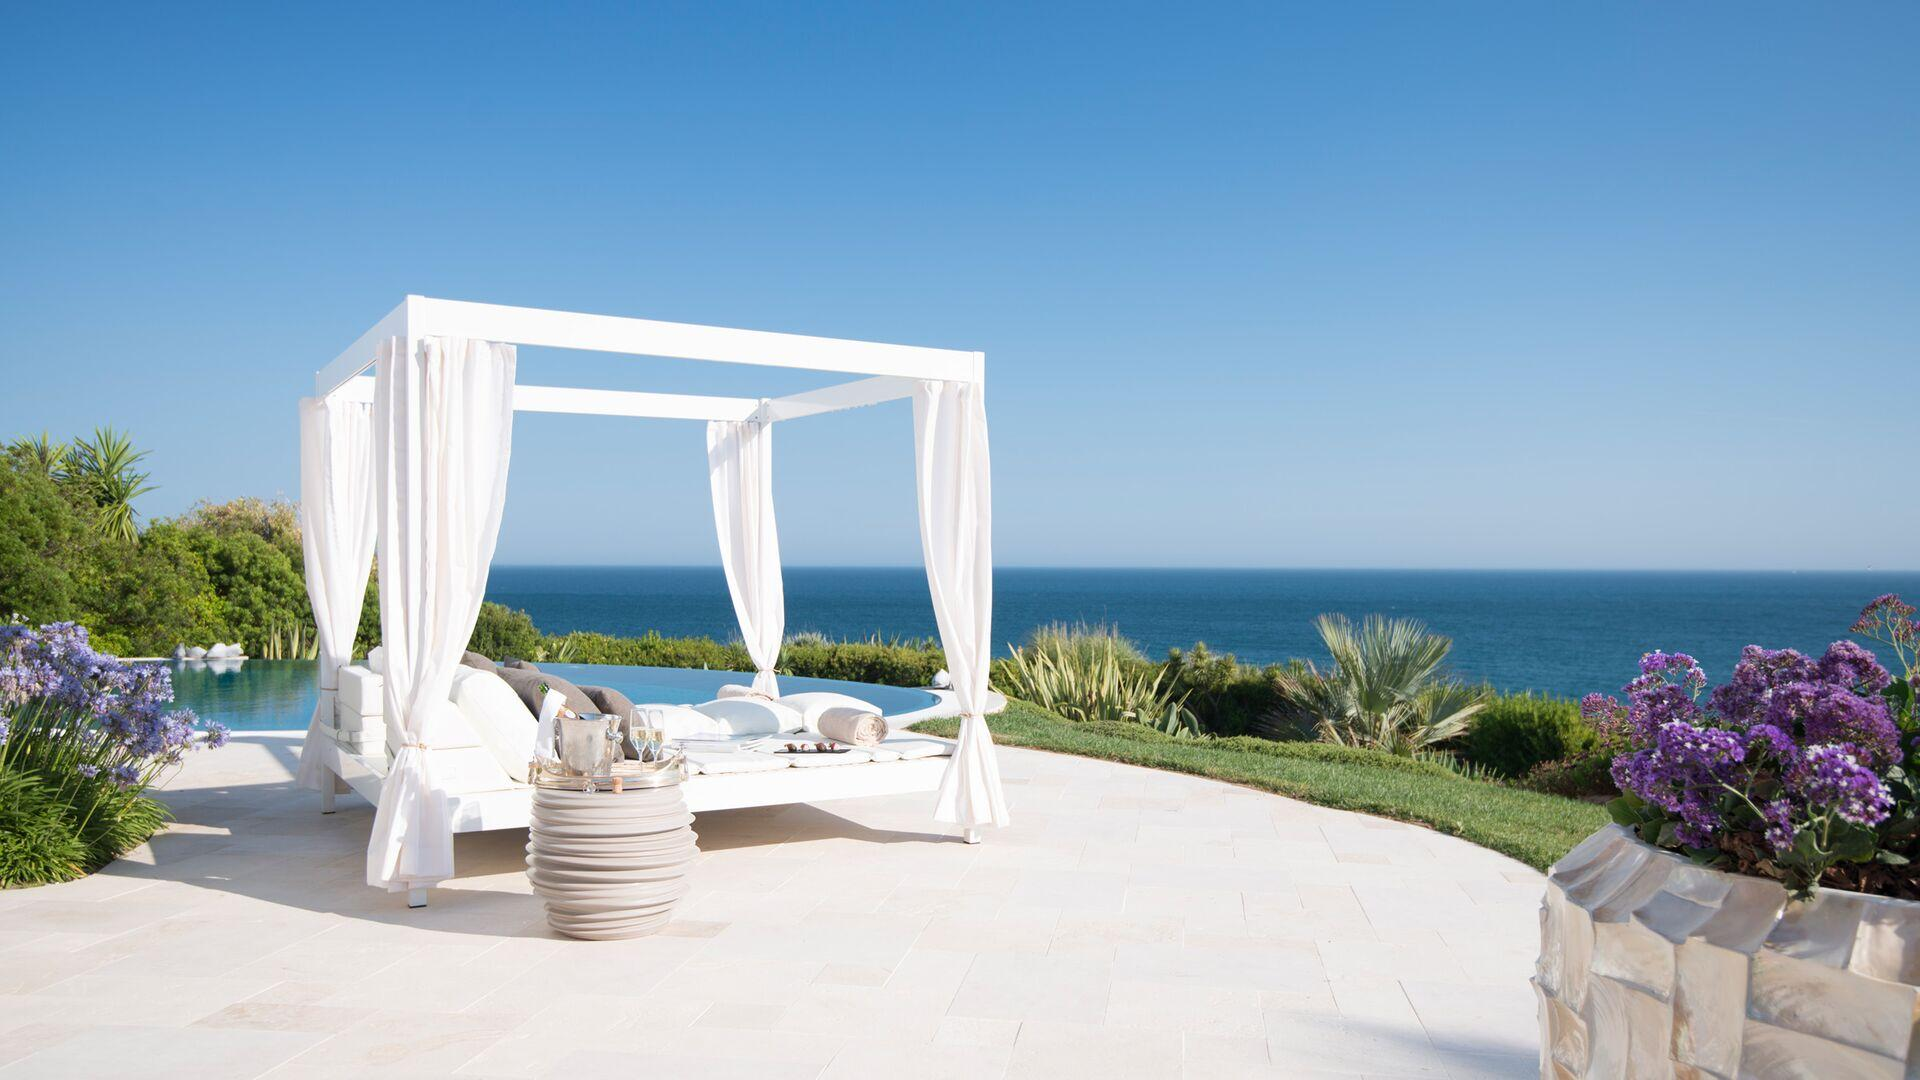 Villa Trevo terrace